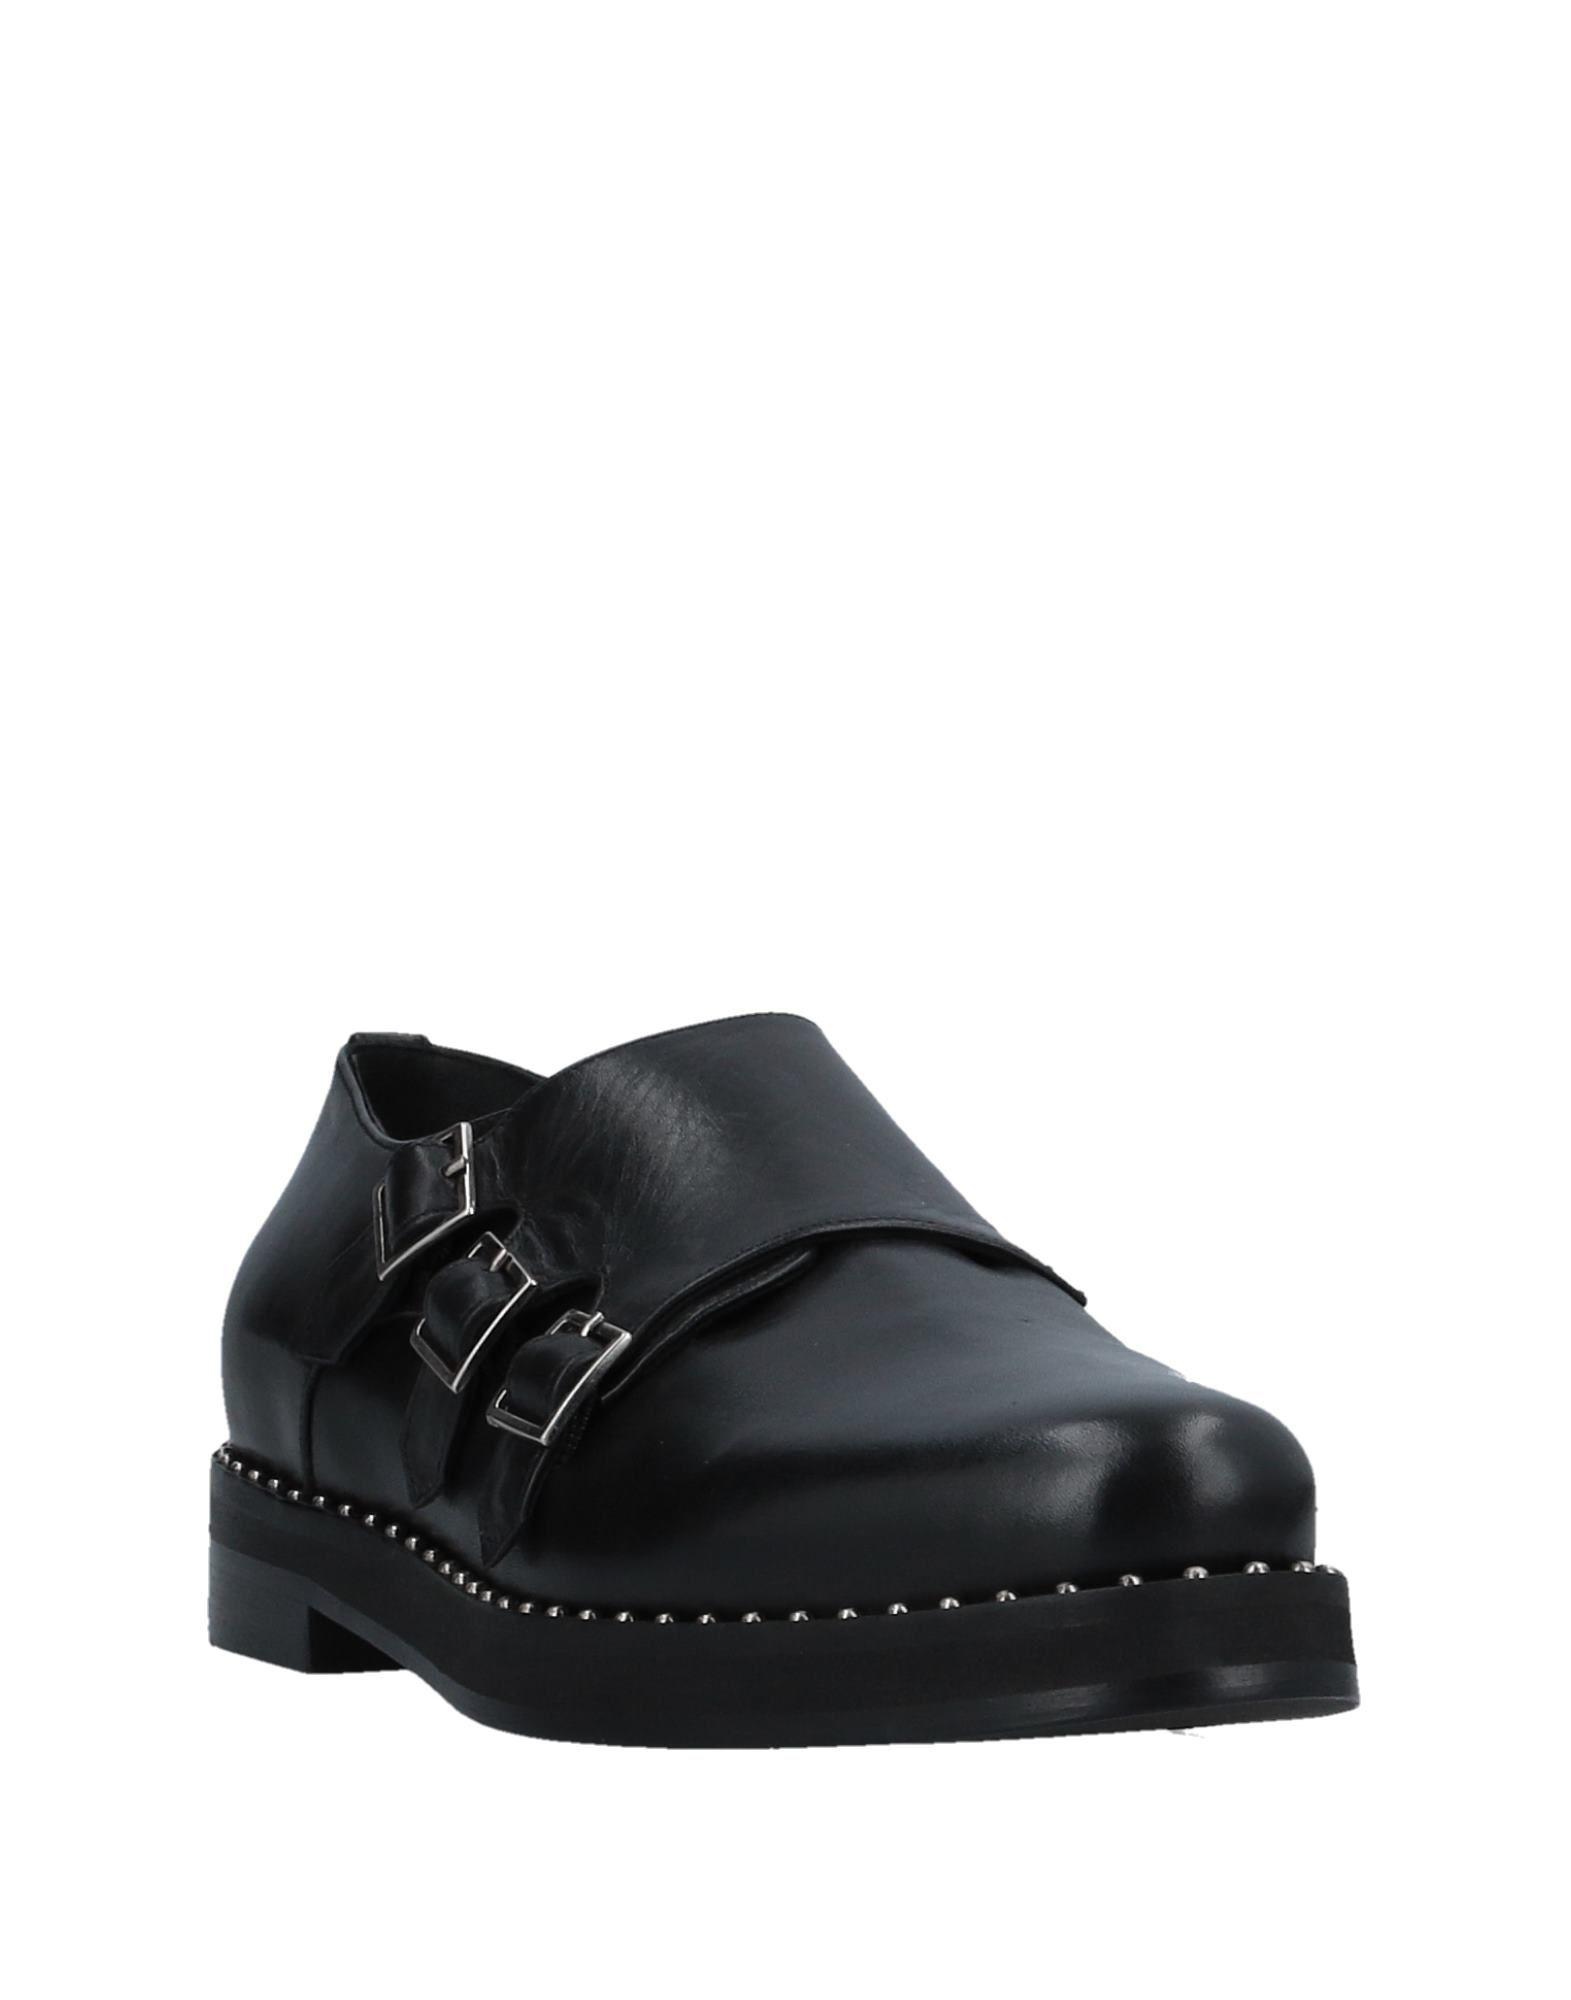 Eglantine Mokassins Damen  11507729BO Schuhe Gute Qualität beliebte Schuhe 11507729BO 4ea914